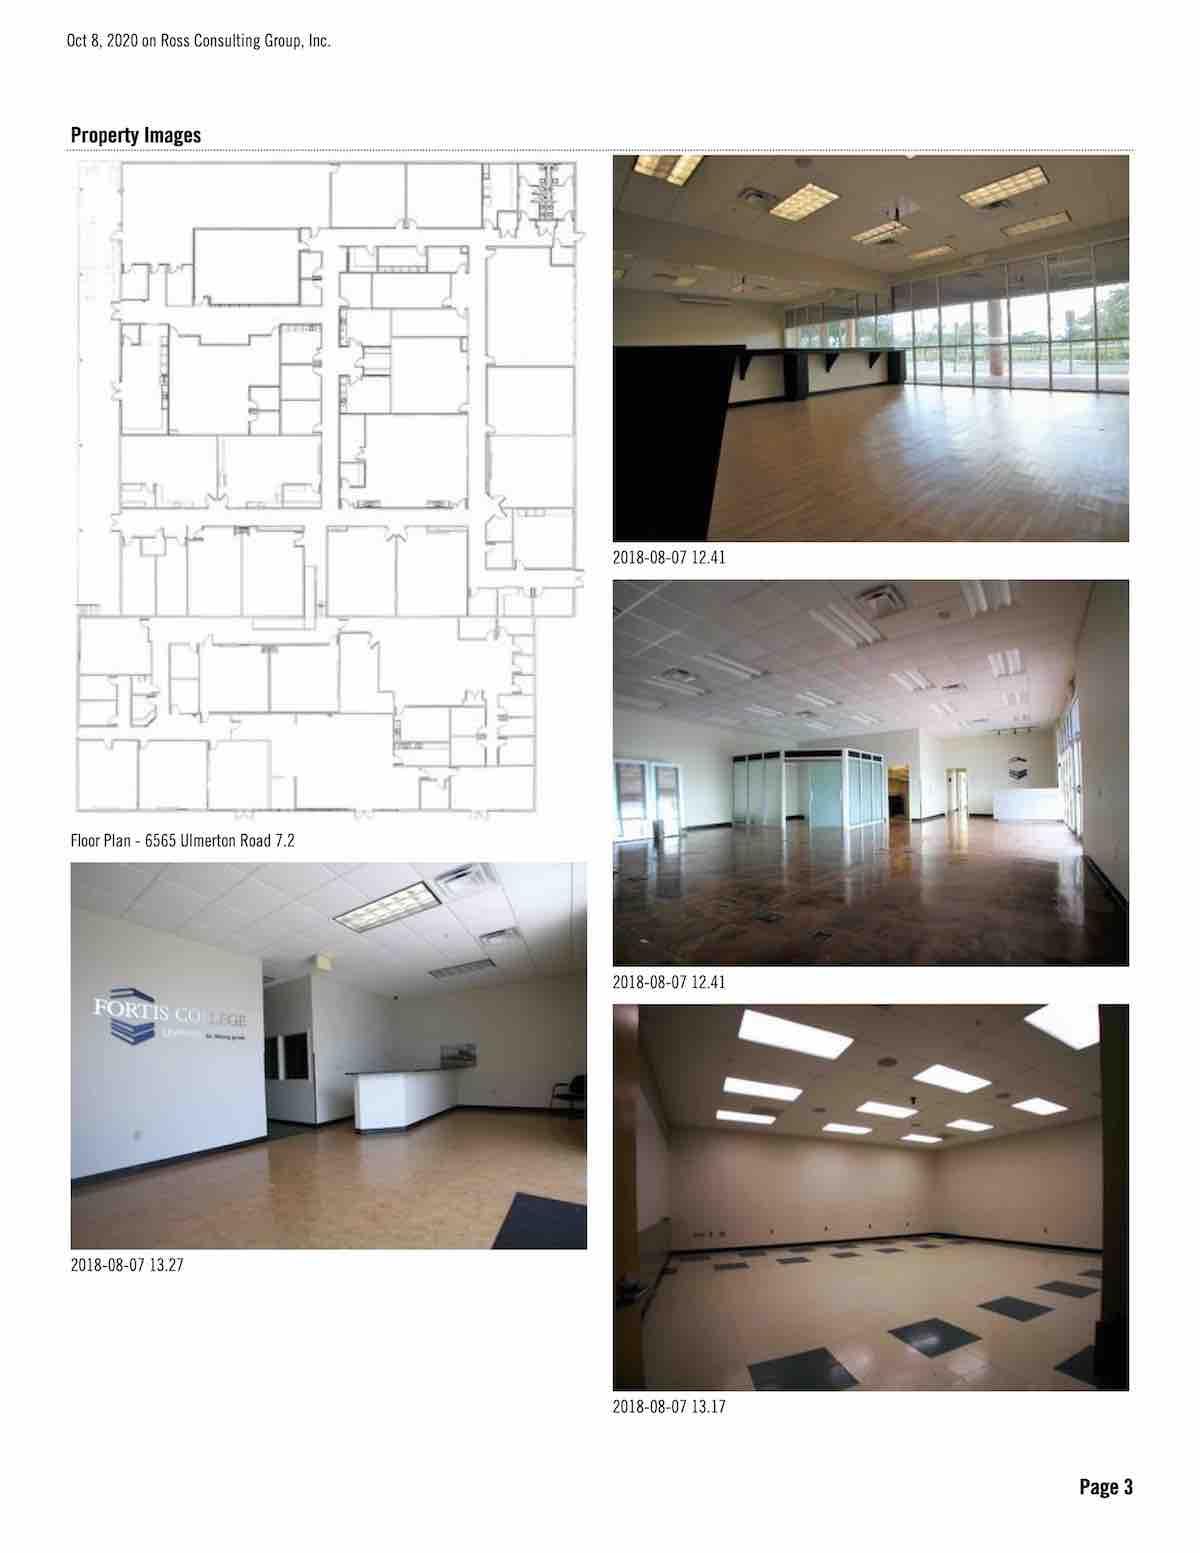 FOR SALE - Fortis College Building - 6565 Ulmerton Rd, Largo, FL 33771 P3